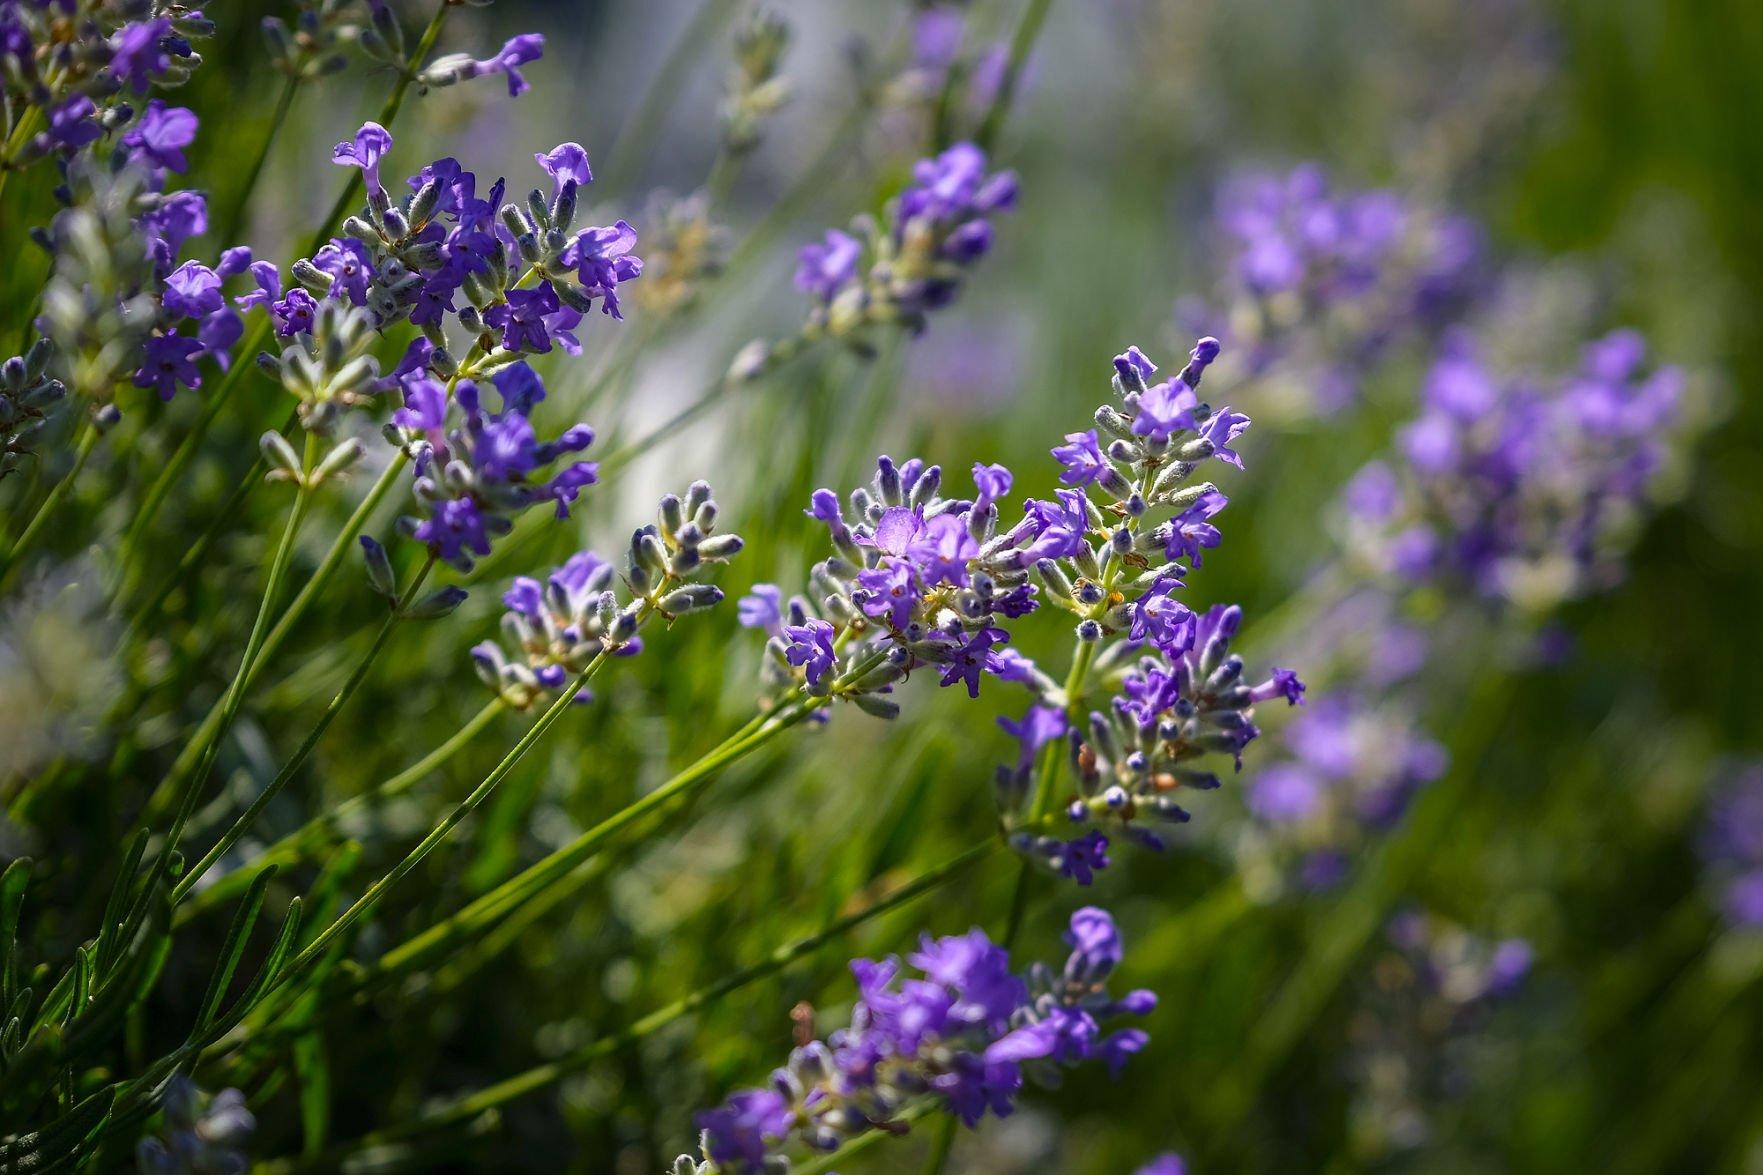 060819-nws-lavender-2.jpg (copy)